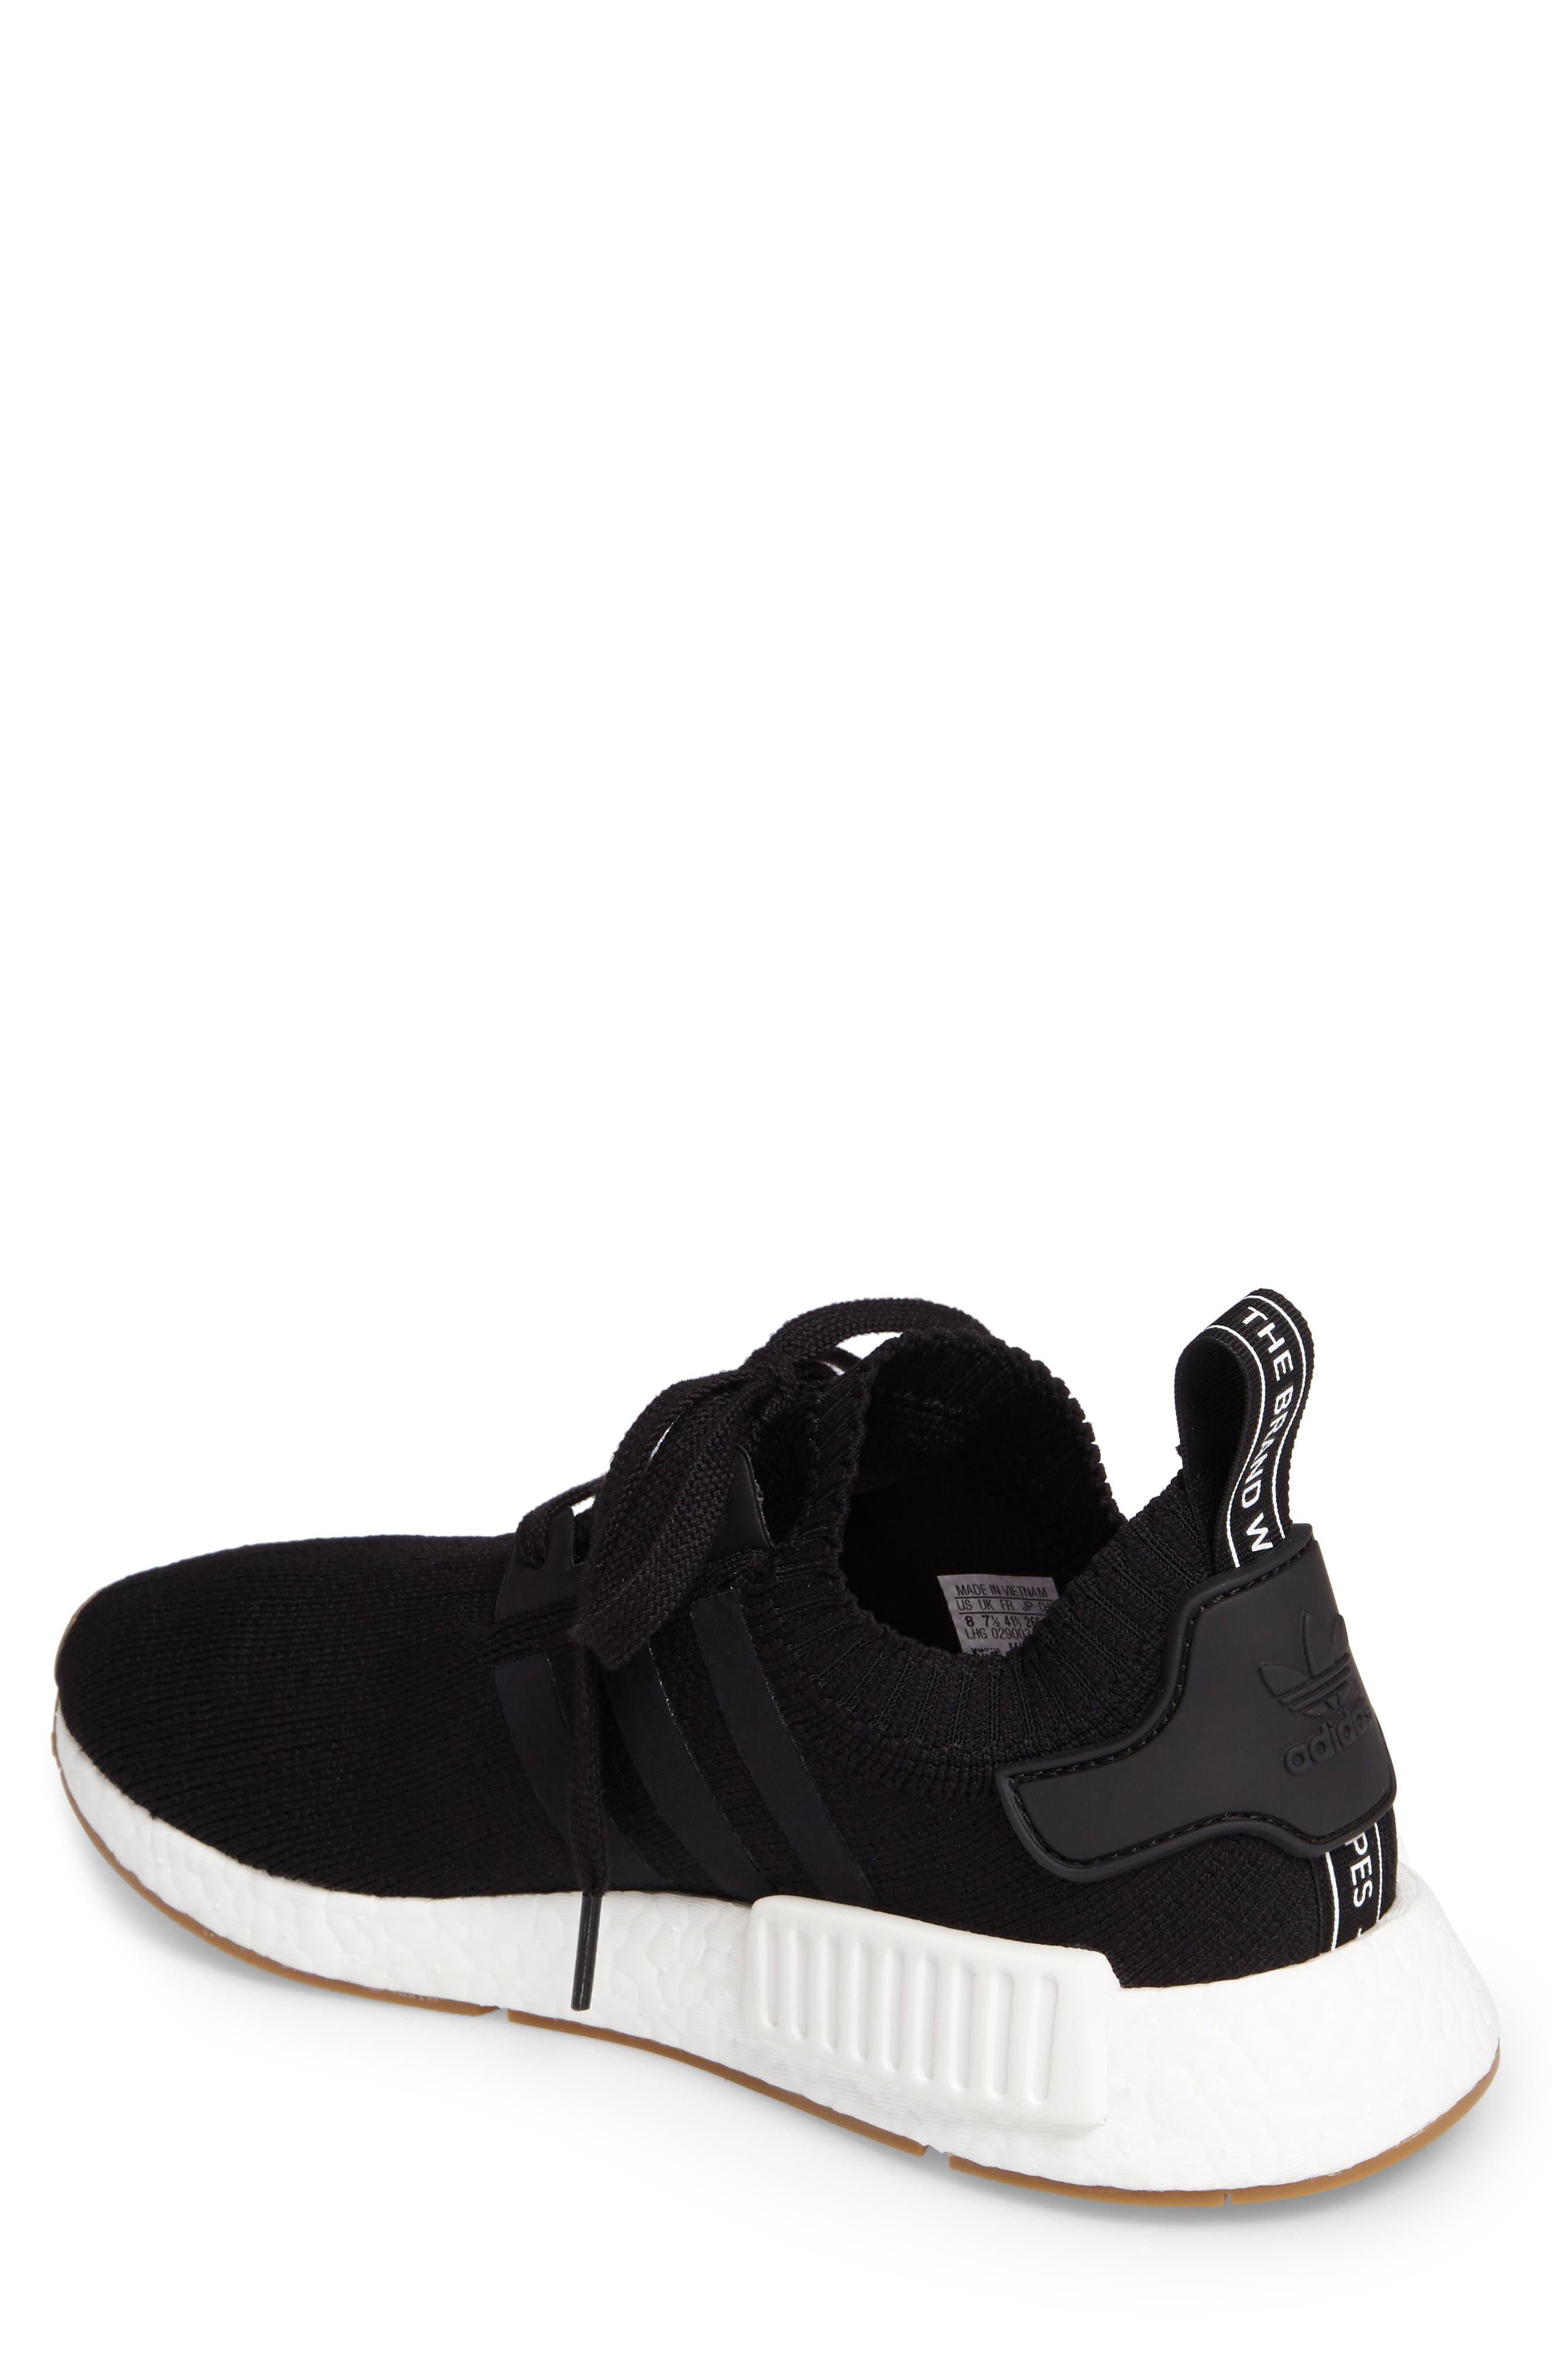 NMD R1 Primeknit Sneaker,                             Alternate thumbnail 2, color,                             002